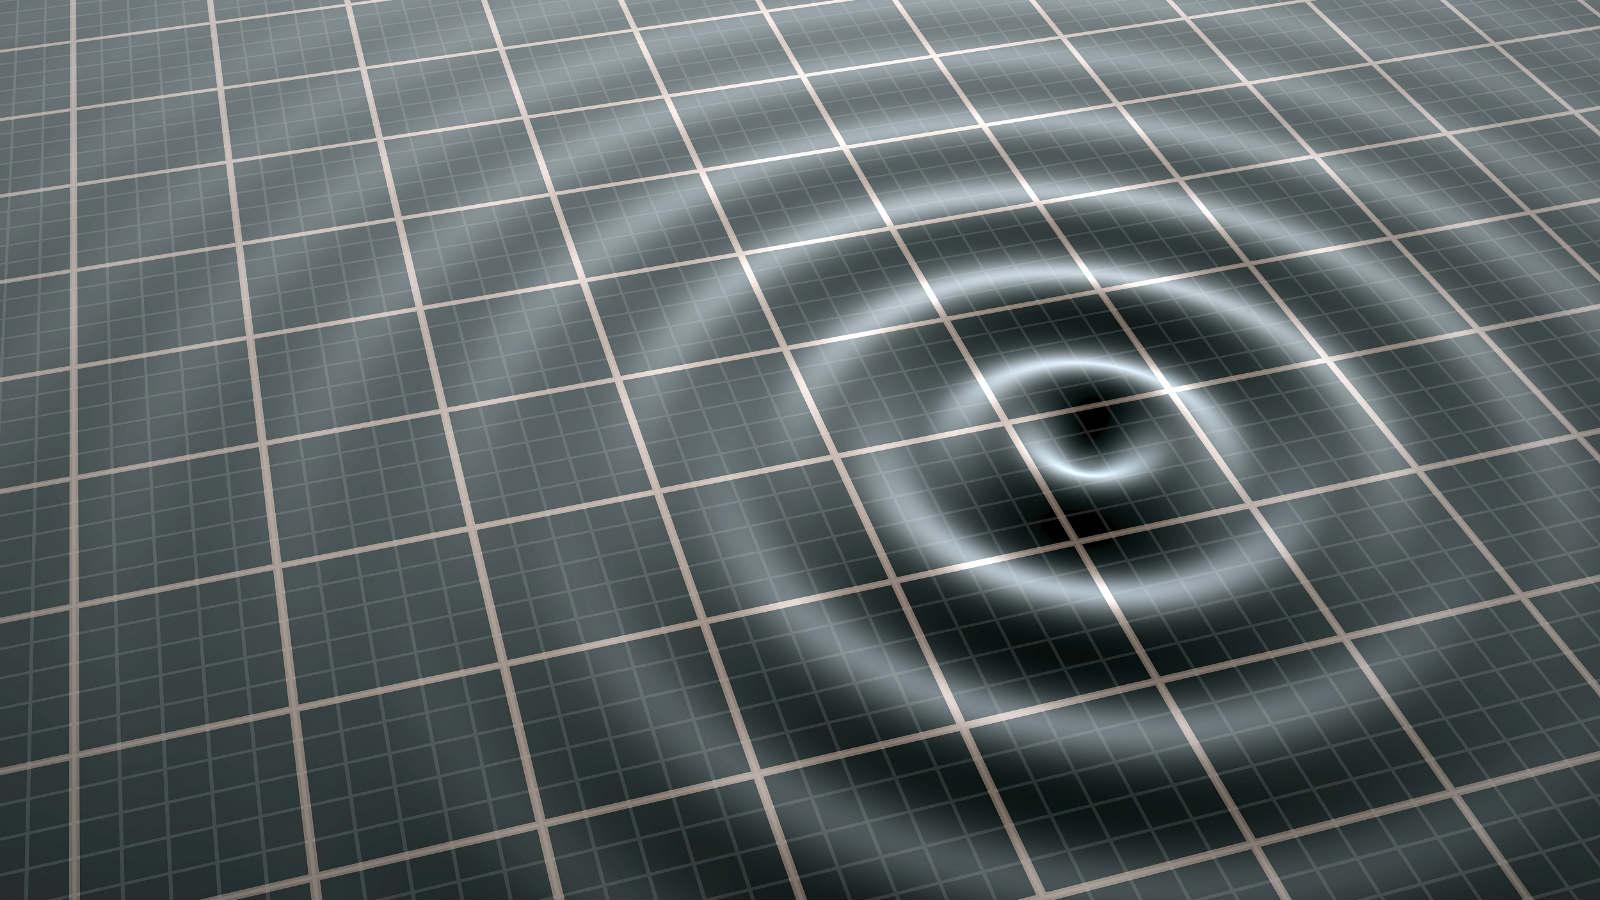 6.2-magnitude quake hits Kermadec Islands region: USGS